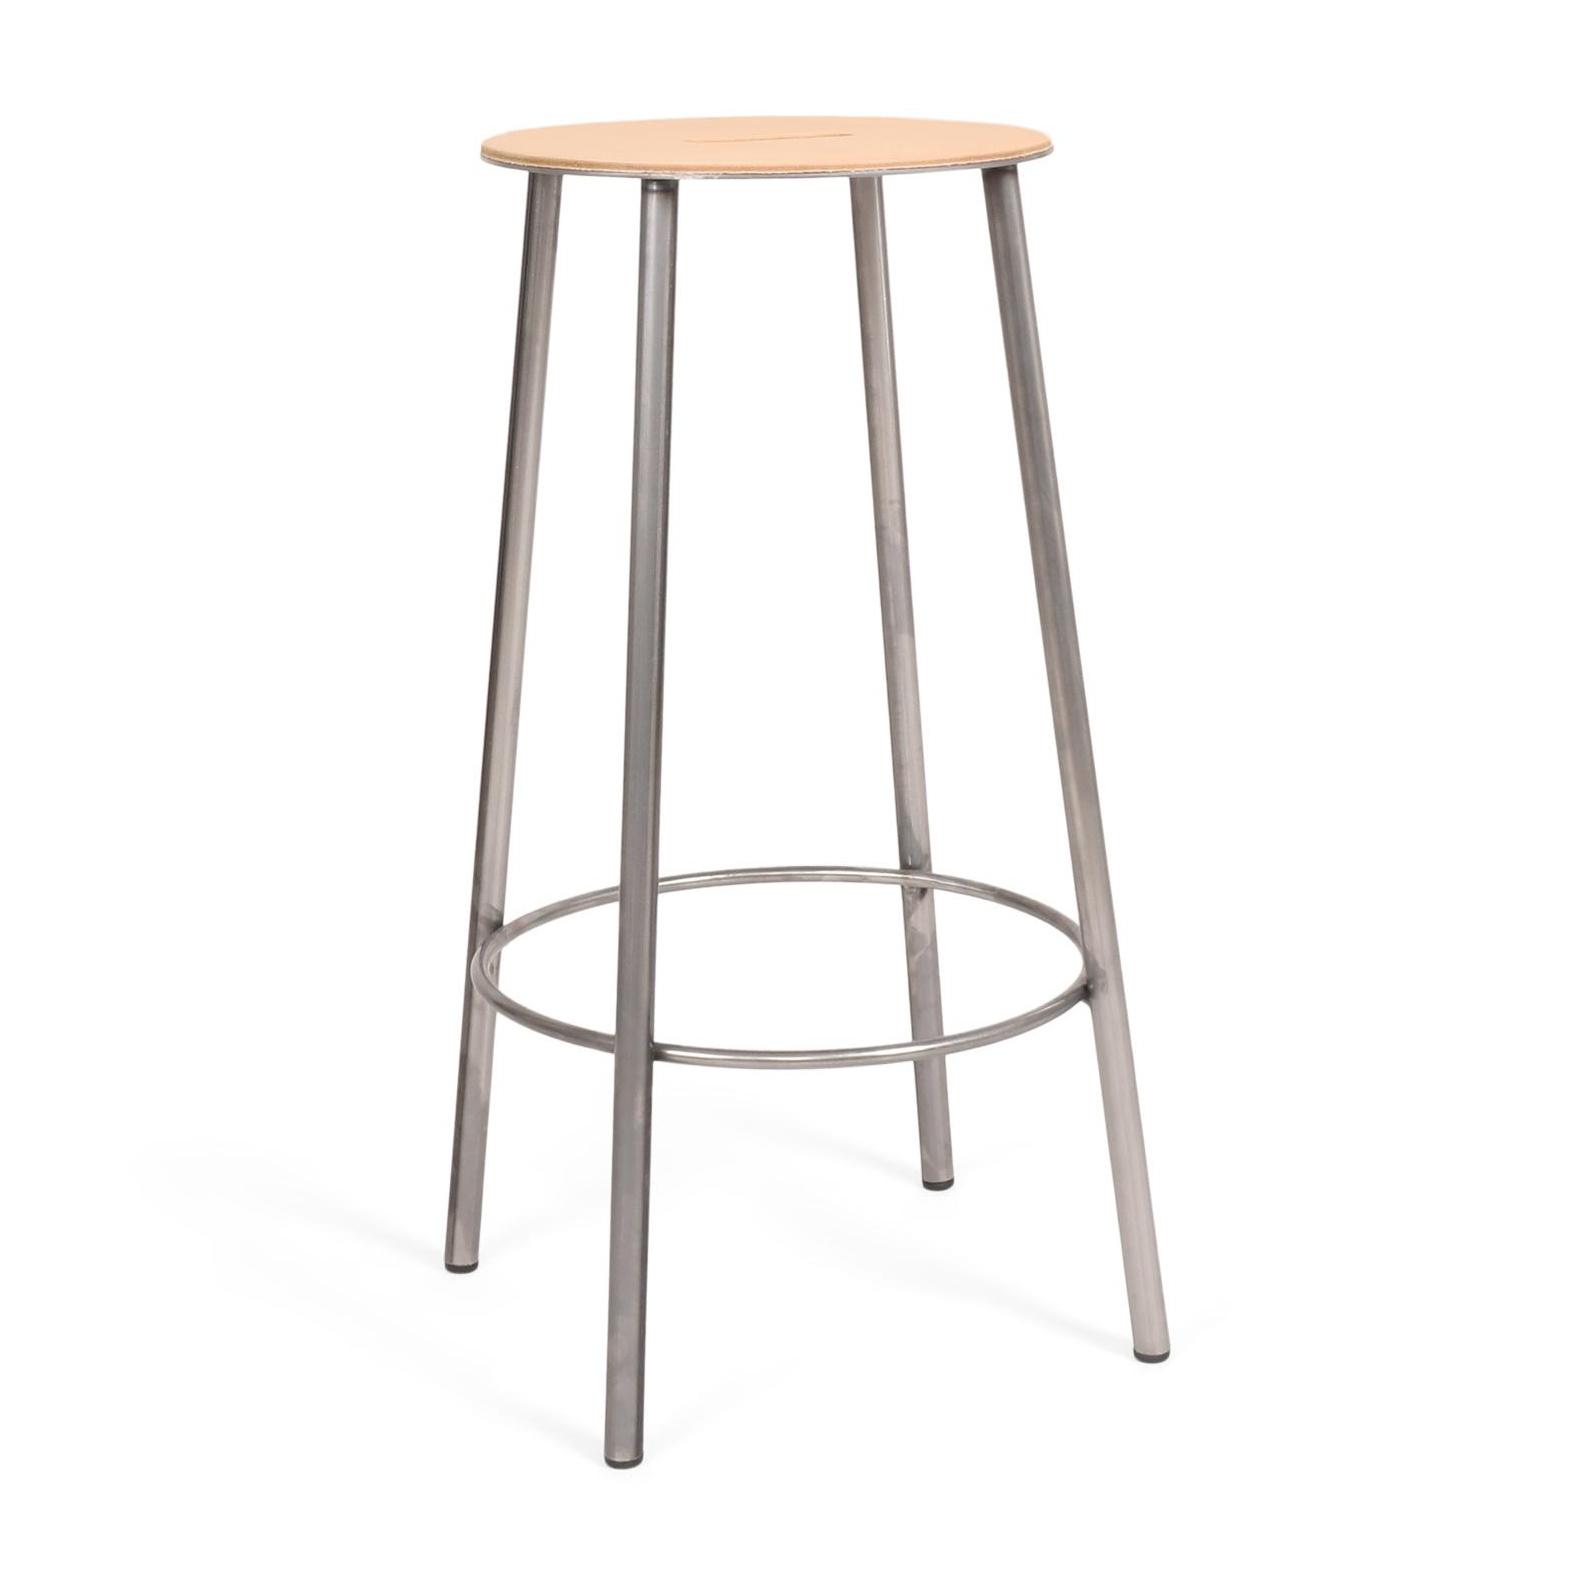 Frama - Adam Hocker H 65cm Leder rund - rohstahl/leder/H 65cm x Ø 31cm günstig online kaufen